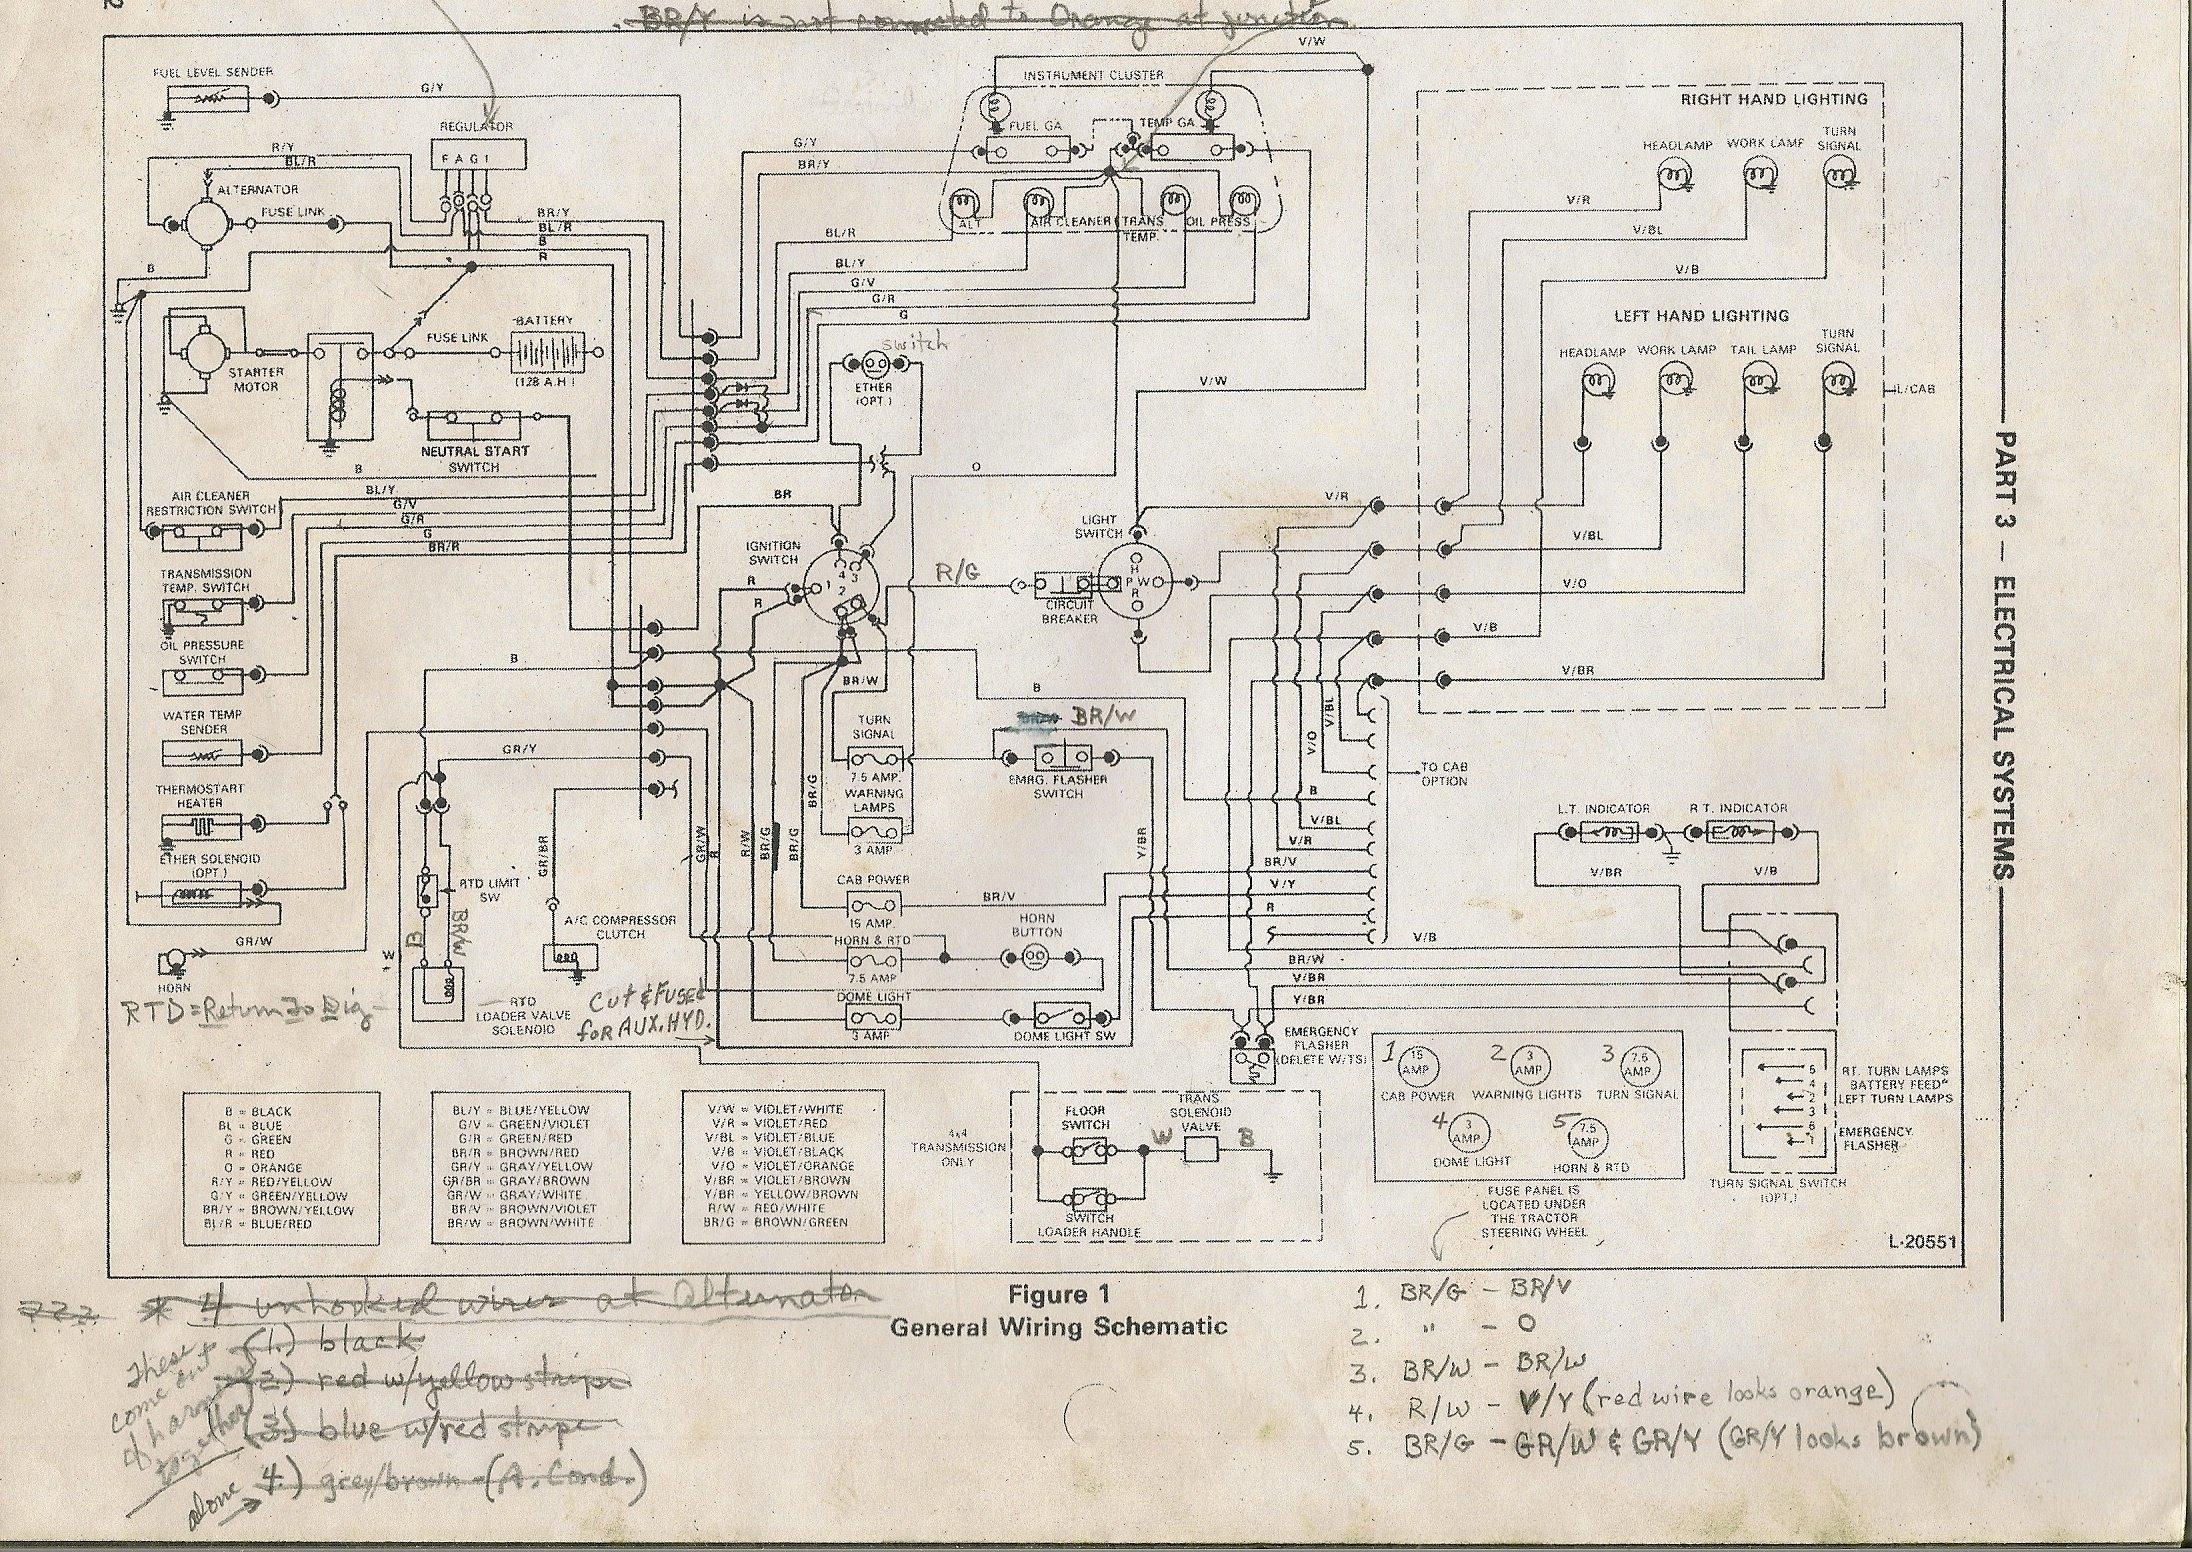 Pleasant Ford 1210 Wiring Wiring Diagram Wiring Cloud Overrenstrafr09Org